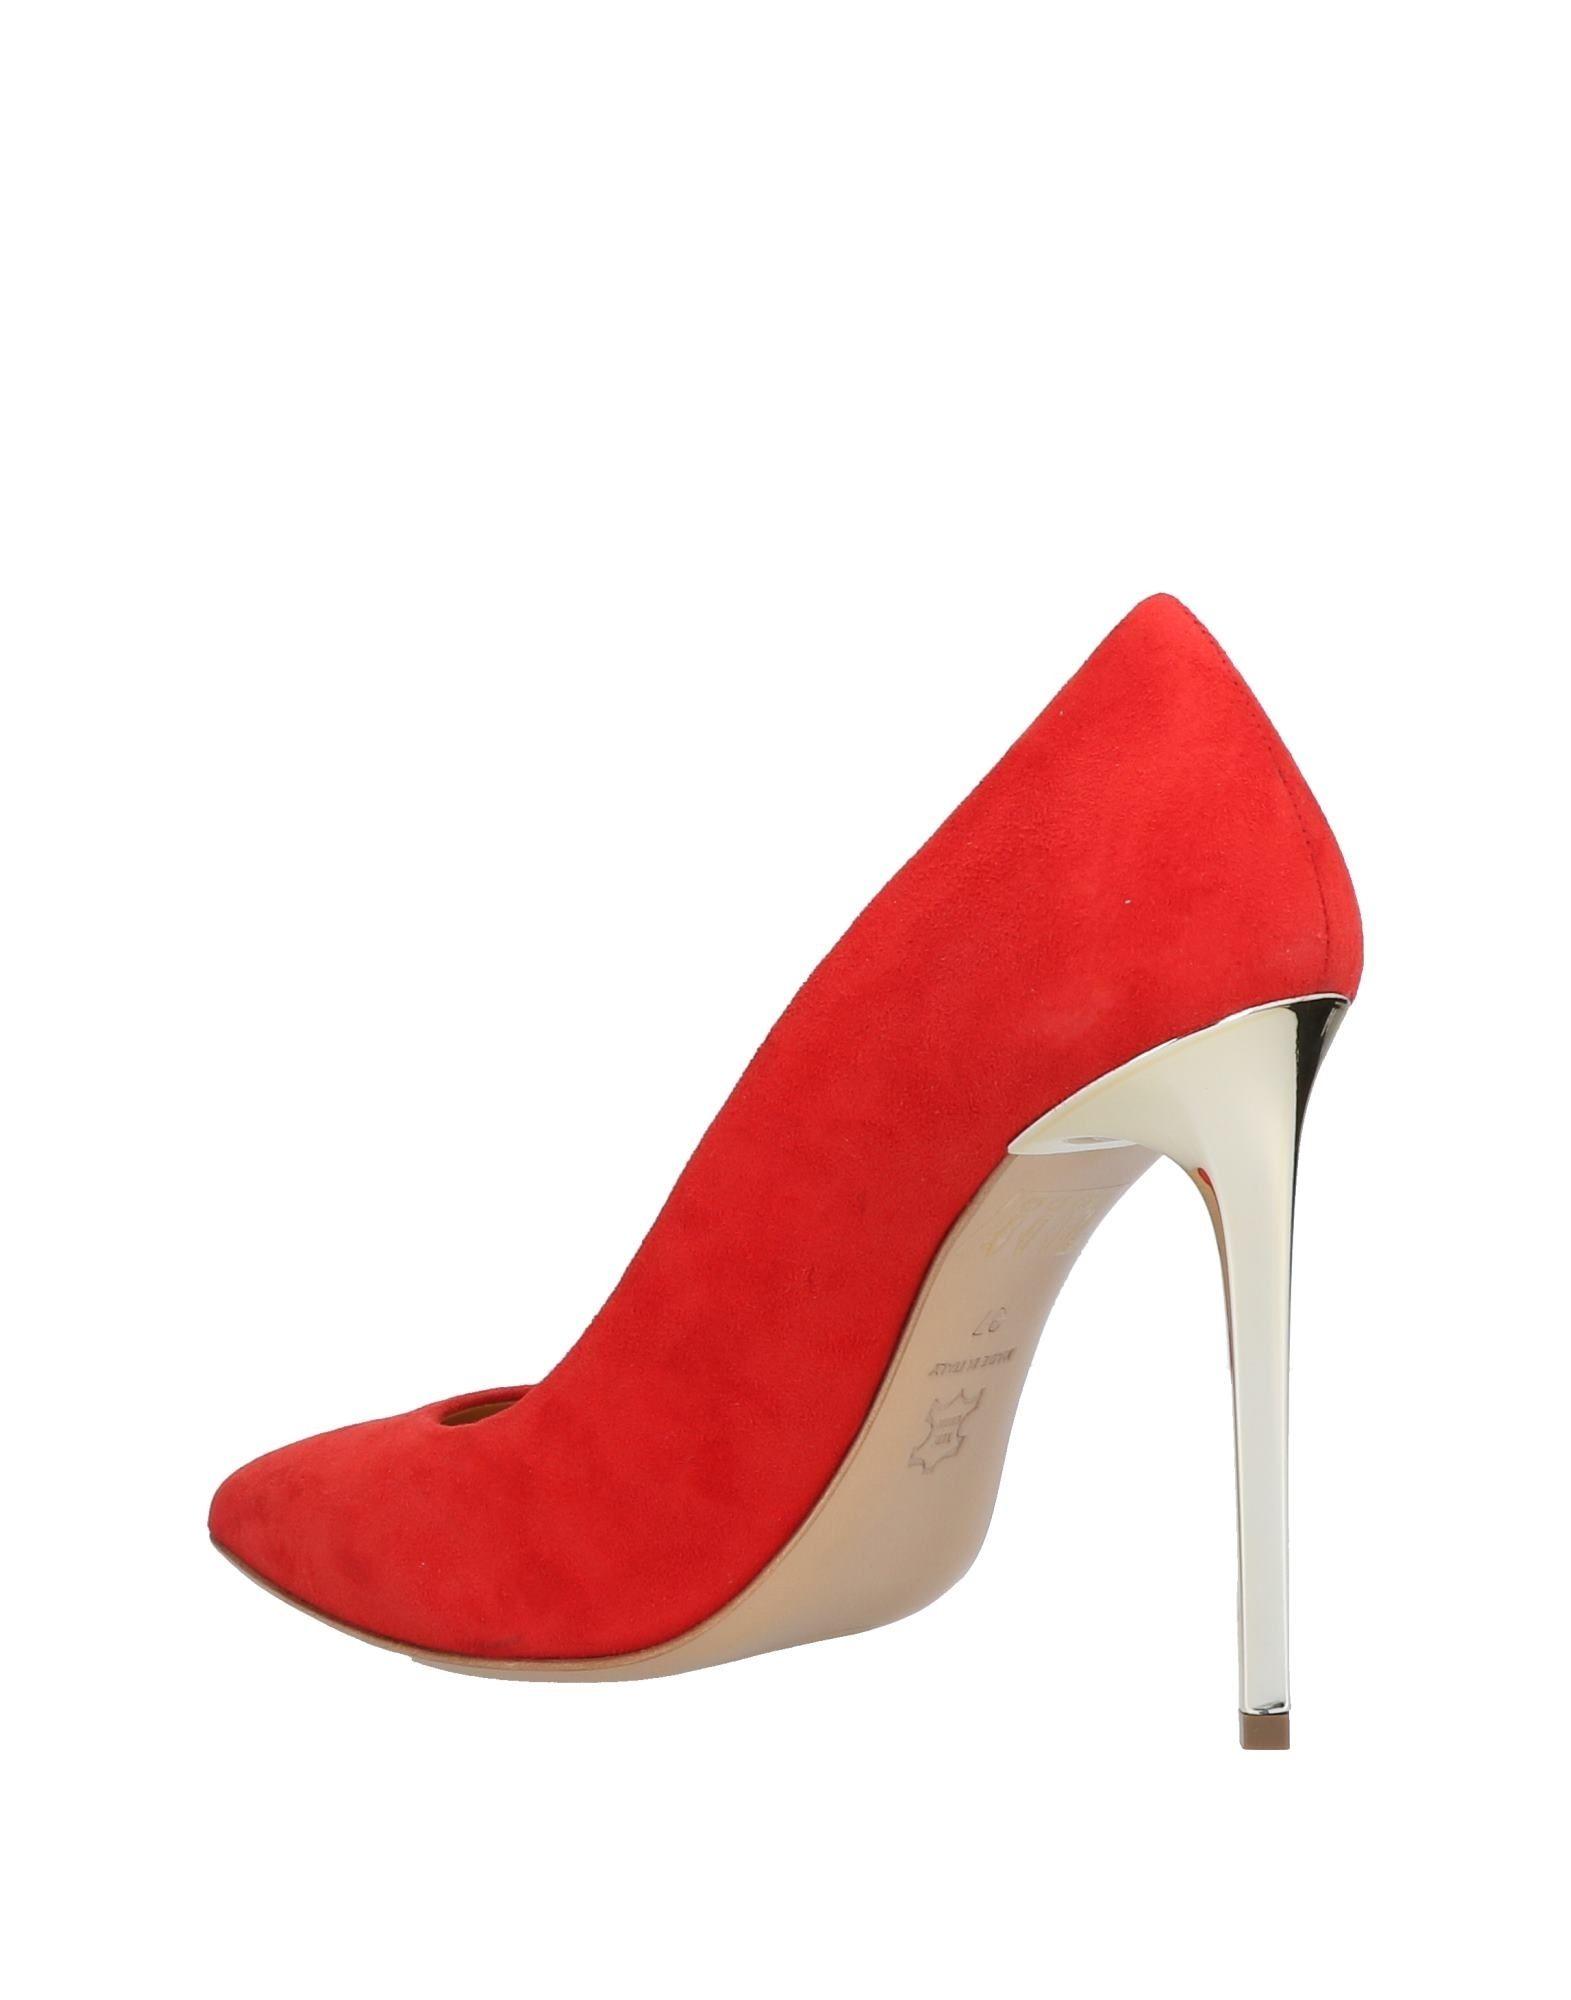 Este Pumps Damen  Qualität 11462174WC Gute Qualität  beliebte Schuhe 0b5766